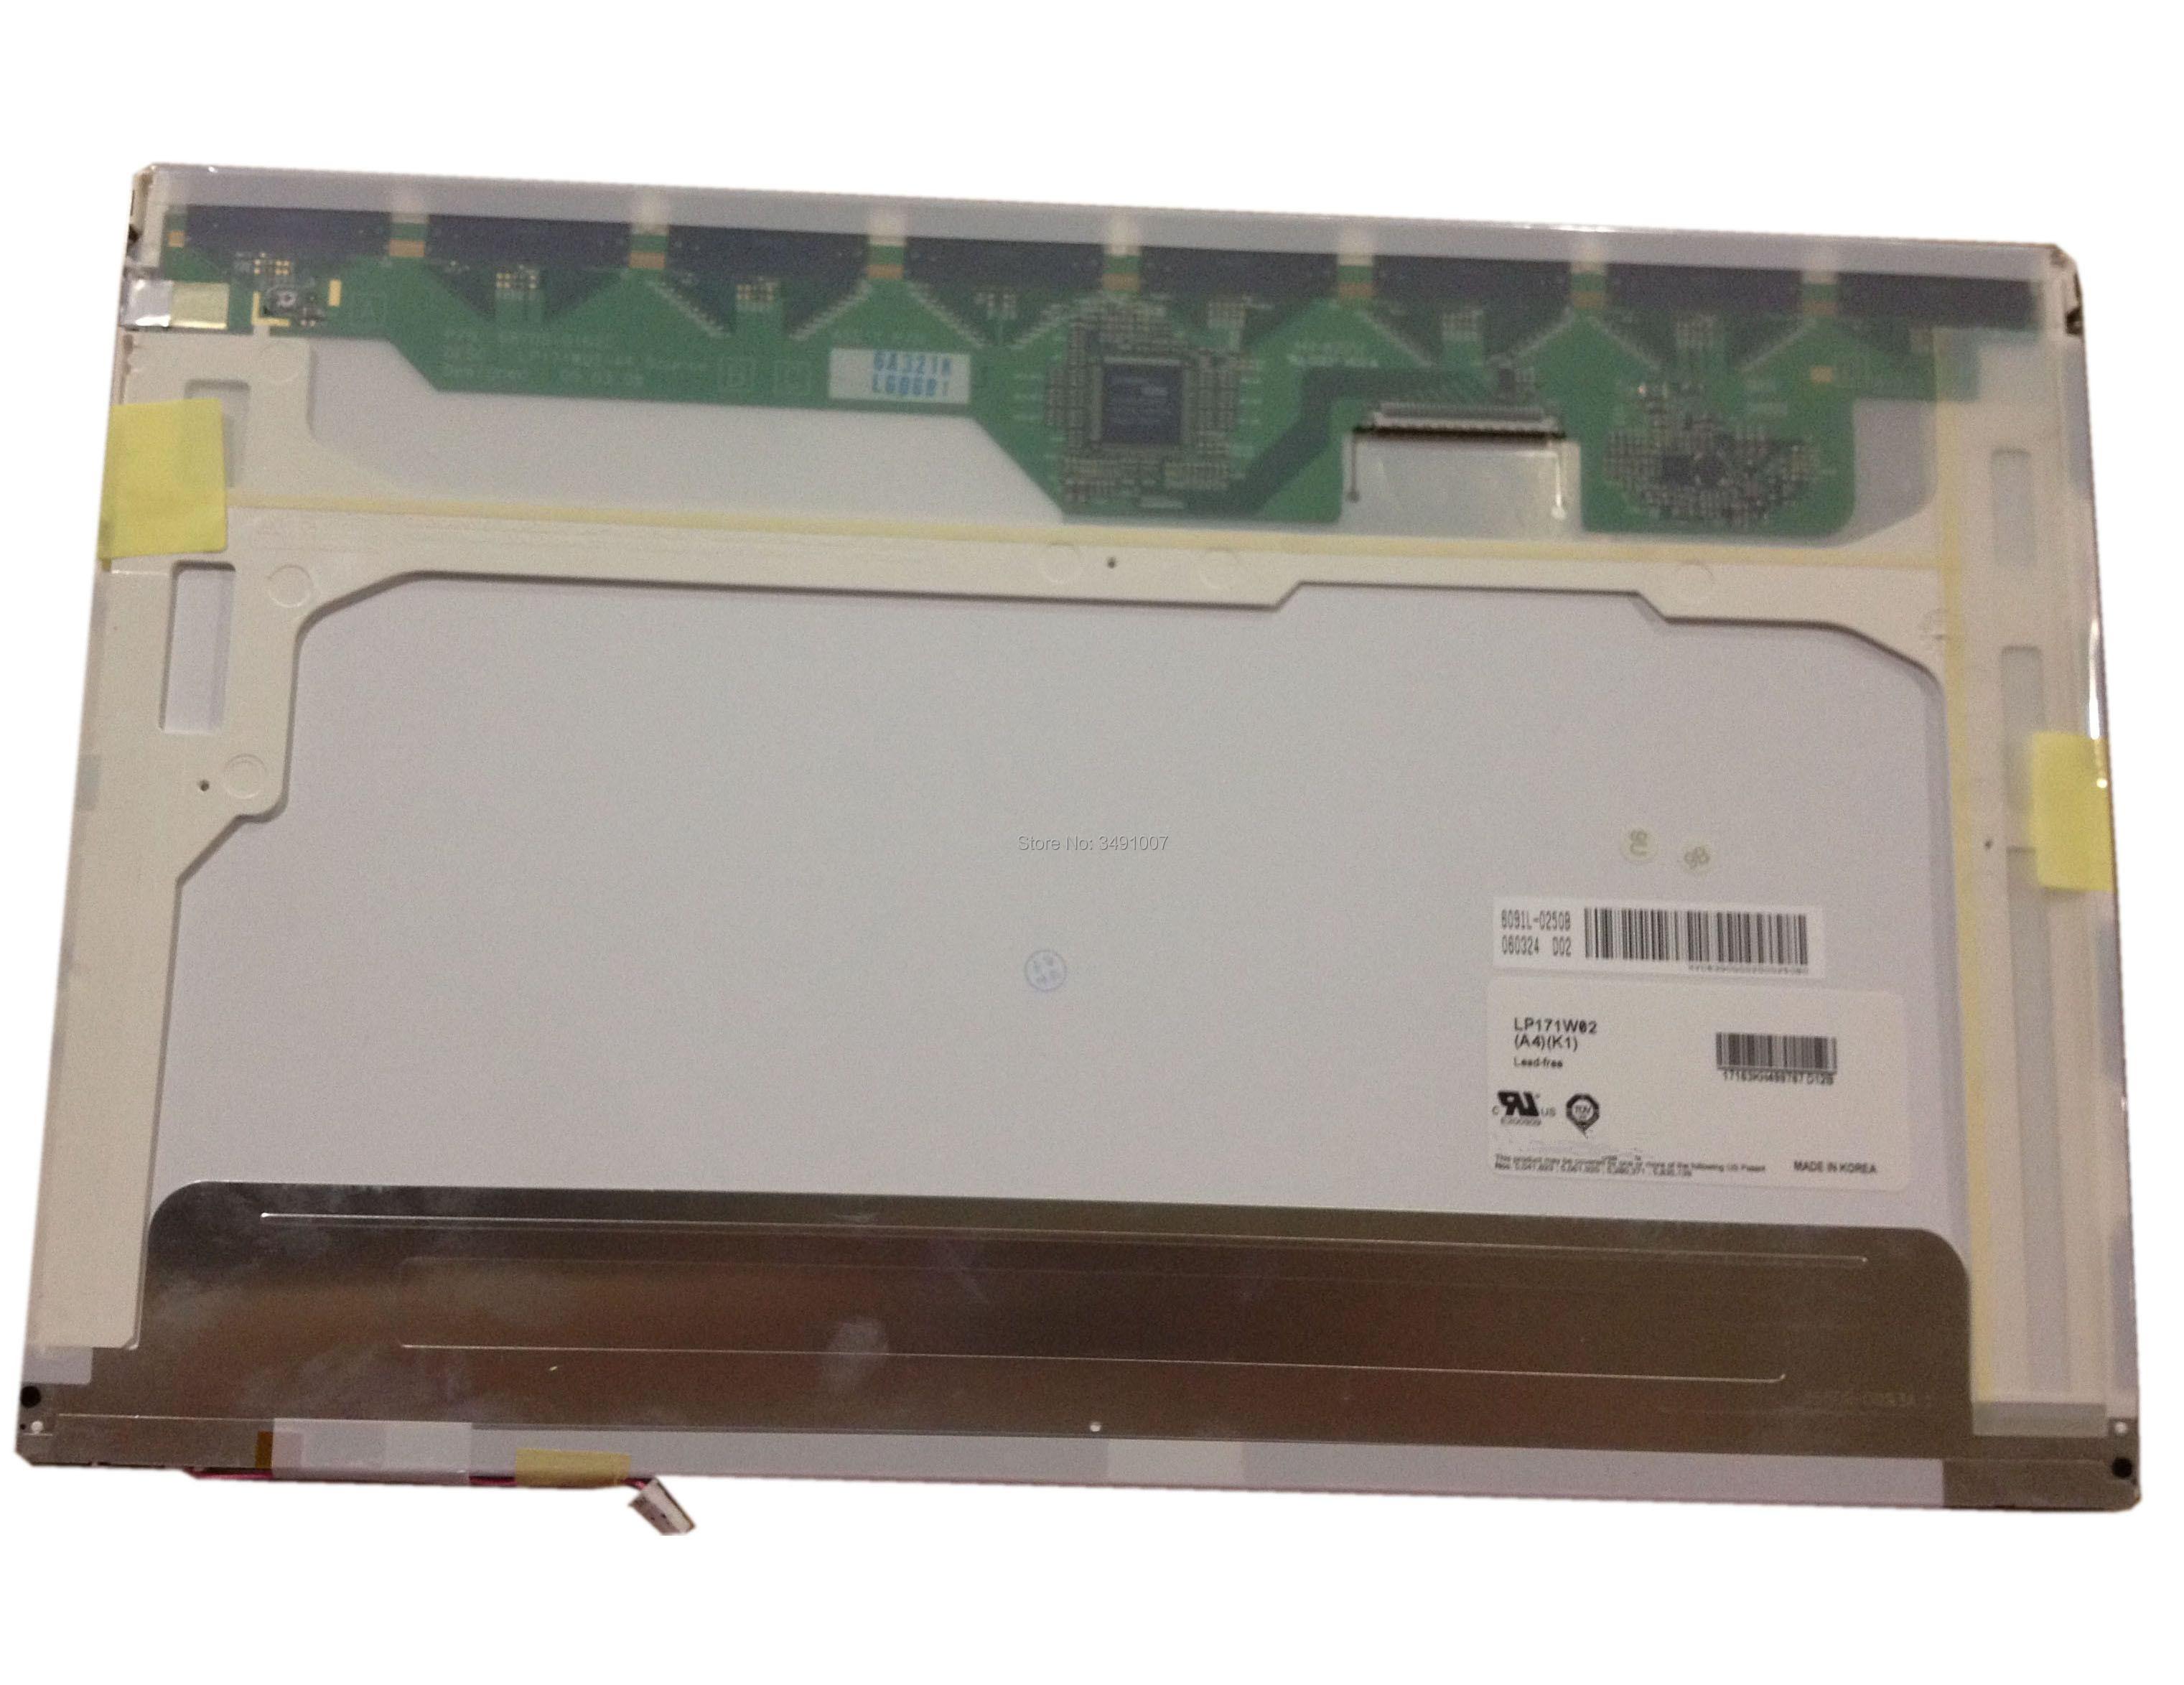 LP171W02 A4  fit LTN170P1-L02 LP171WE2 LP171WE3 LTN170WP-L02 LP171W02 LTN170P2-L02 LCD Screen 1680*1050 PanelLP171W02 A4  fit LTN170P1-L02 LP171WE2 LP171WE3 LTN170WP-L02 LP171W02 LTN170P2-L02 LCD Screen 1680*1050 Panel